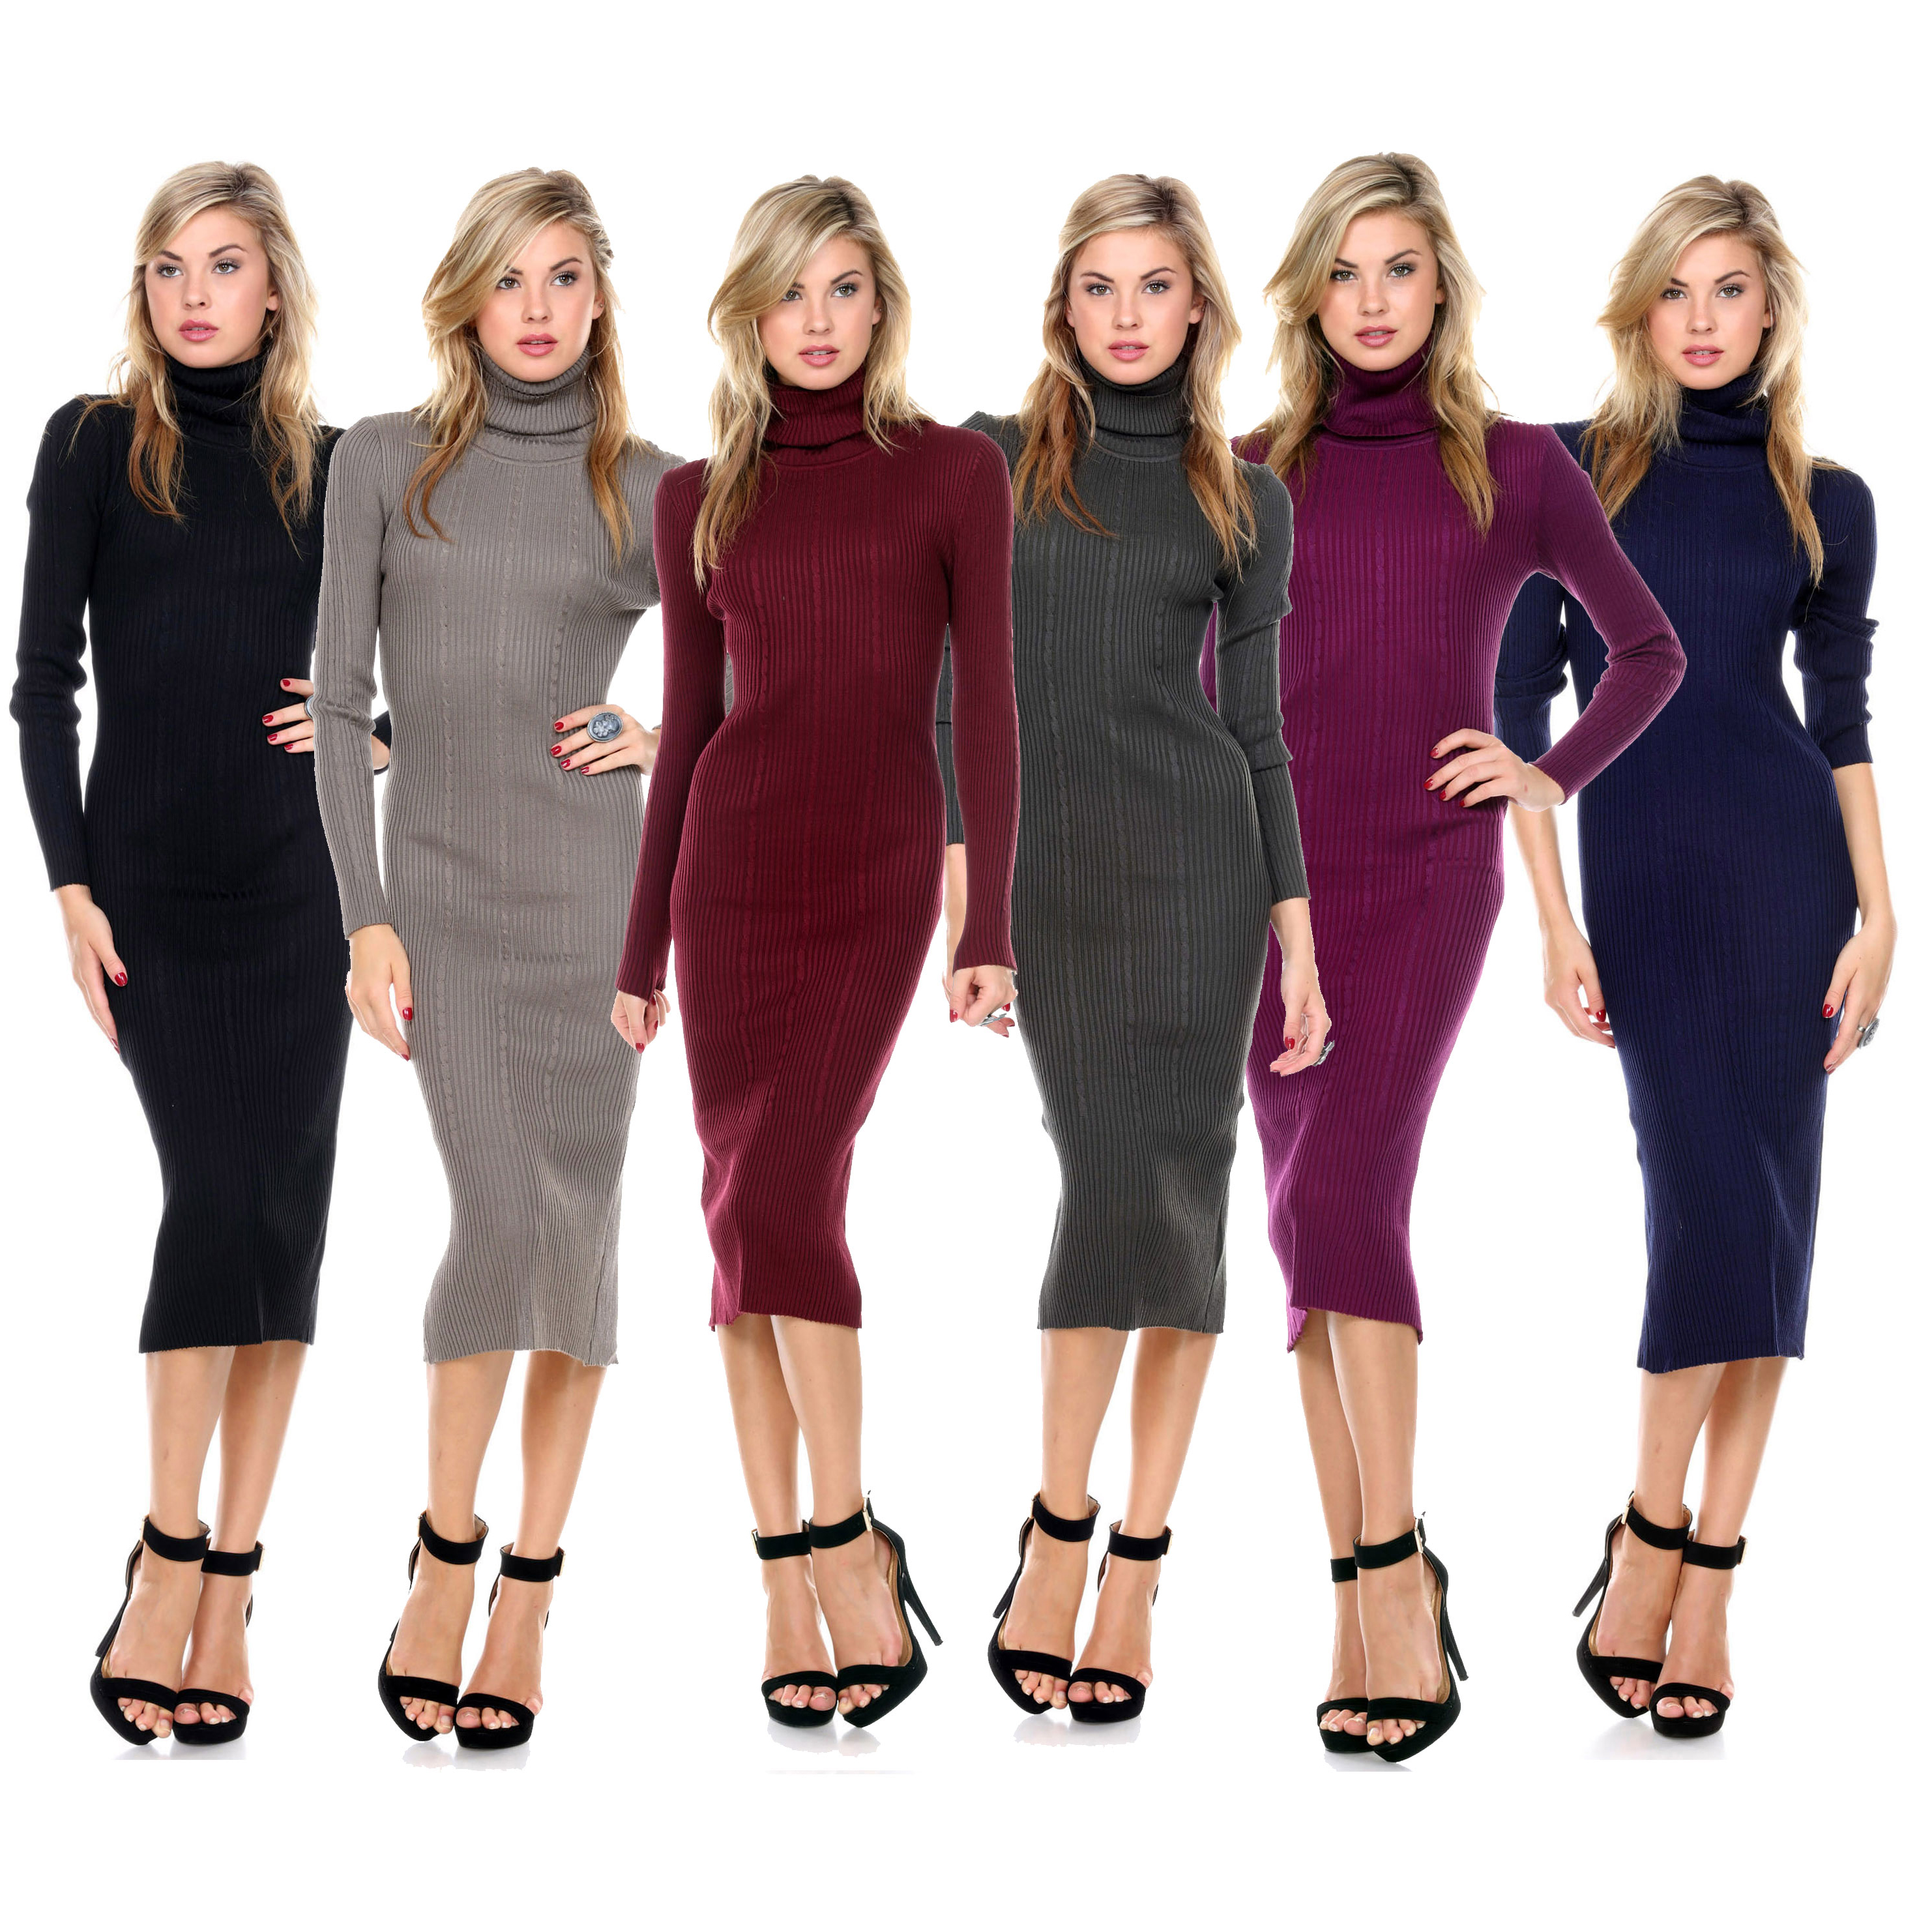 Women s Stretchy Tunic Turtleneck Sweater Dress ae2c897966d9